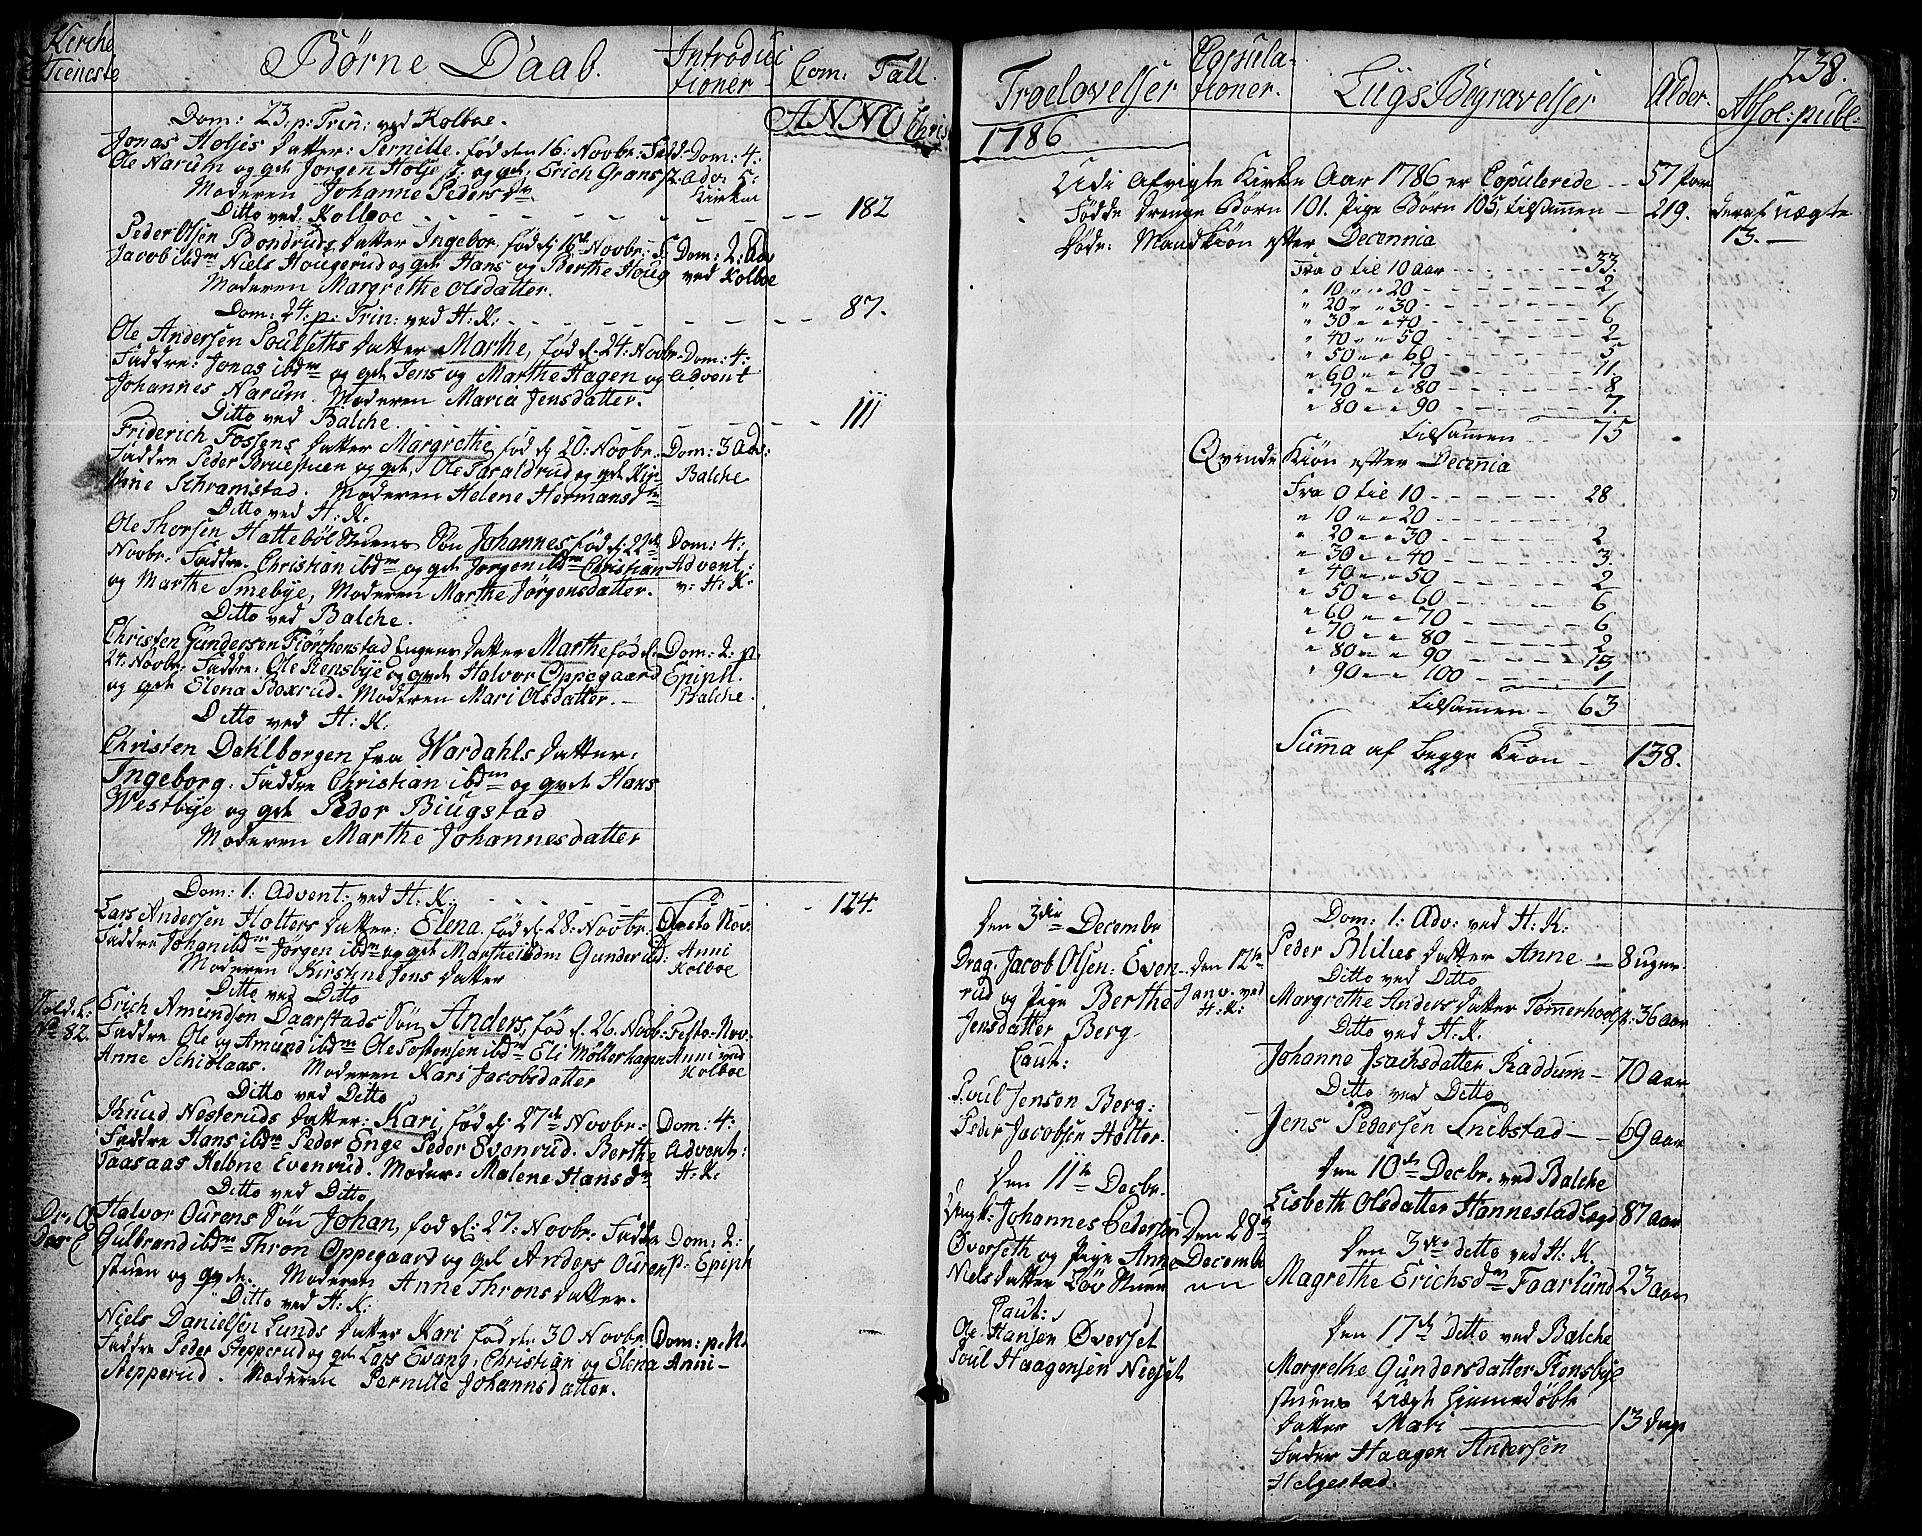 SAH, Toten prestekontor, Ministerialbok nr. 6, 1773-1793, s. 238